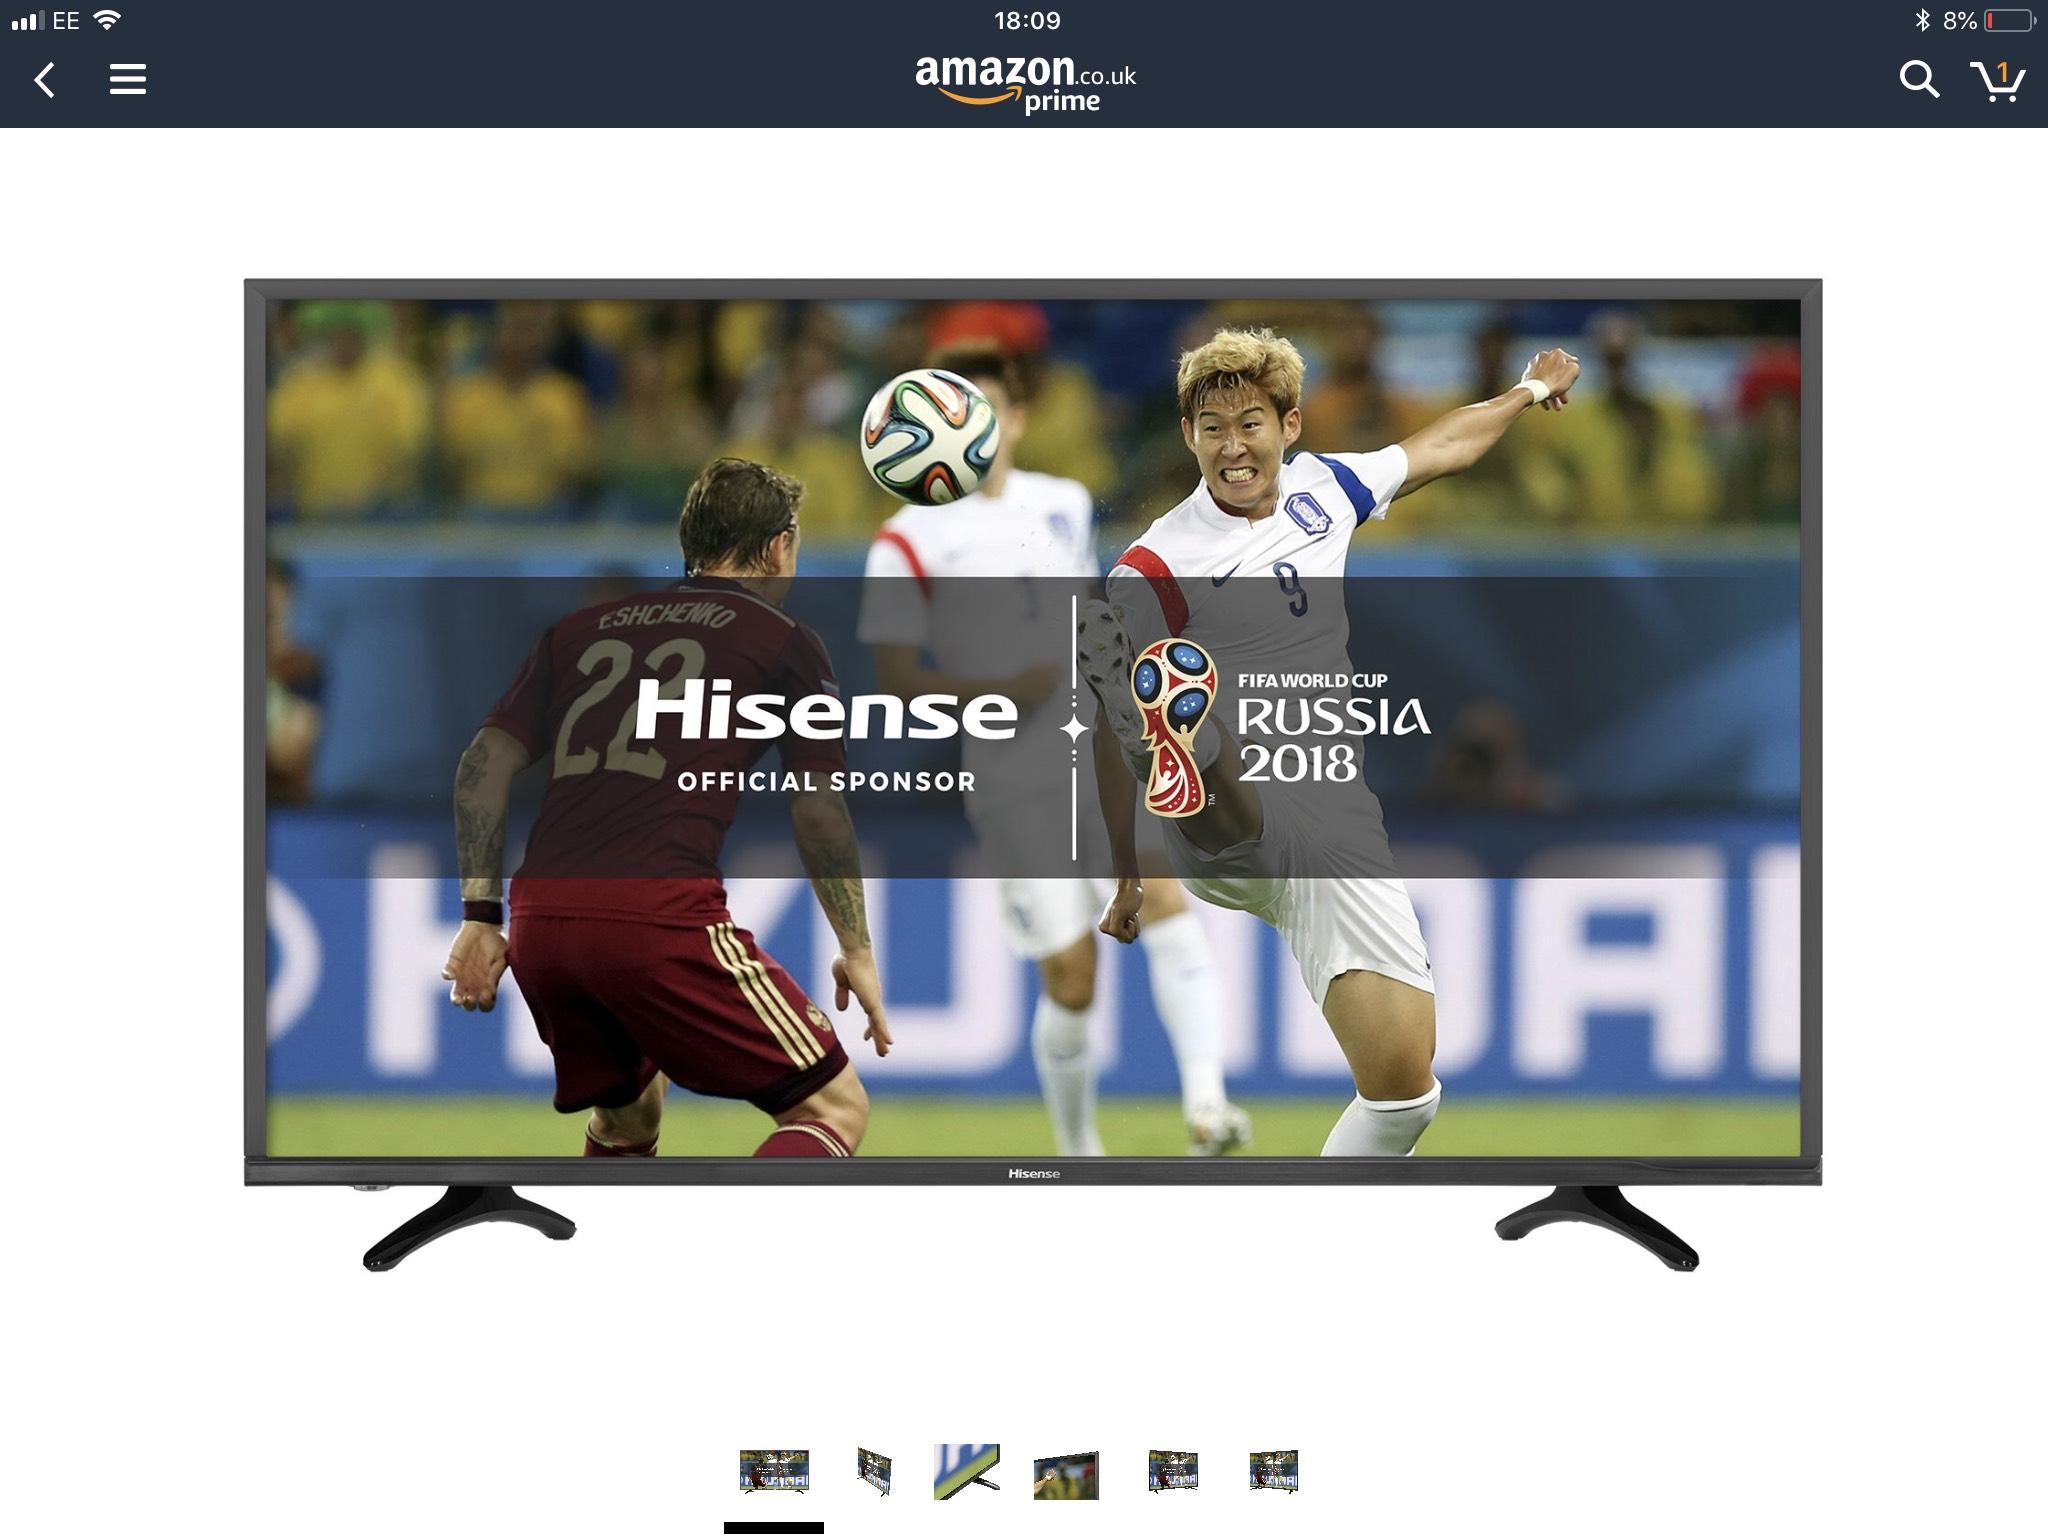 Hisense H43N5500UK 43inch 4K UHD Smart TV - Black (2017 Model) @ Amazon - £246.39